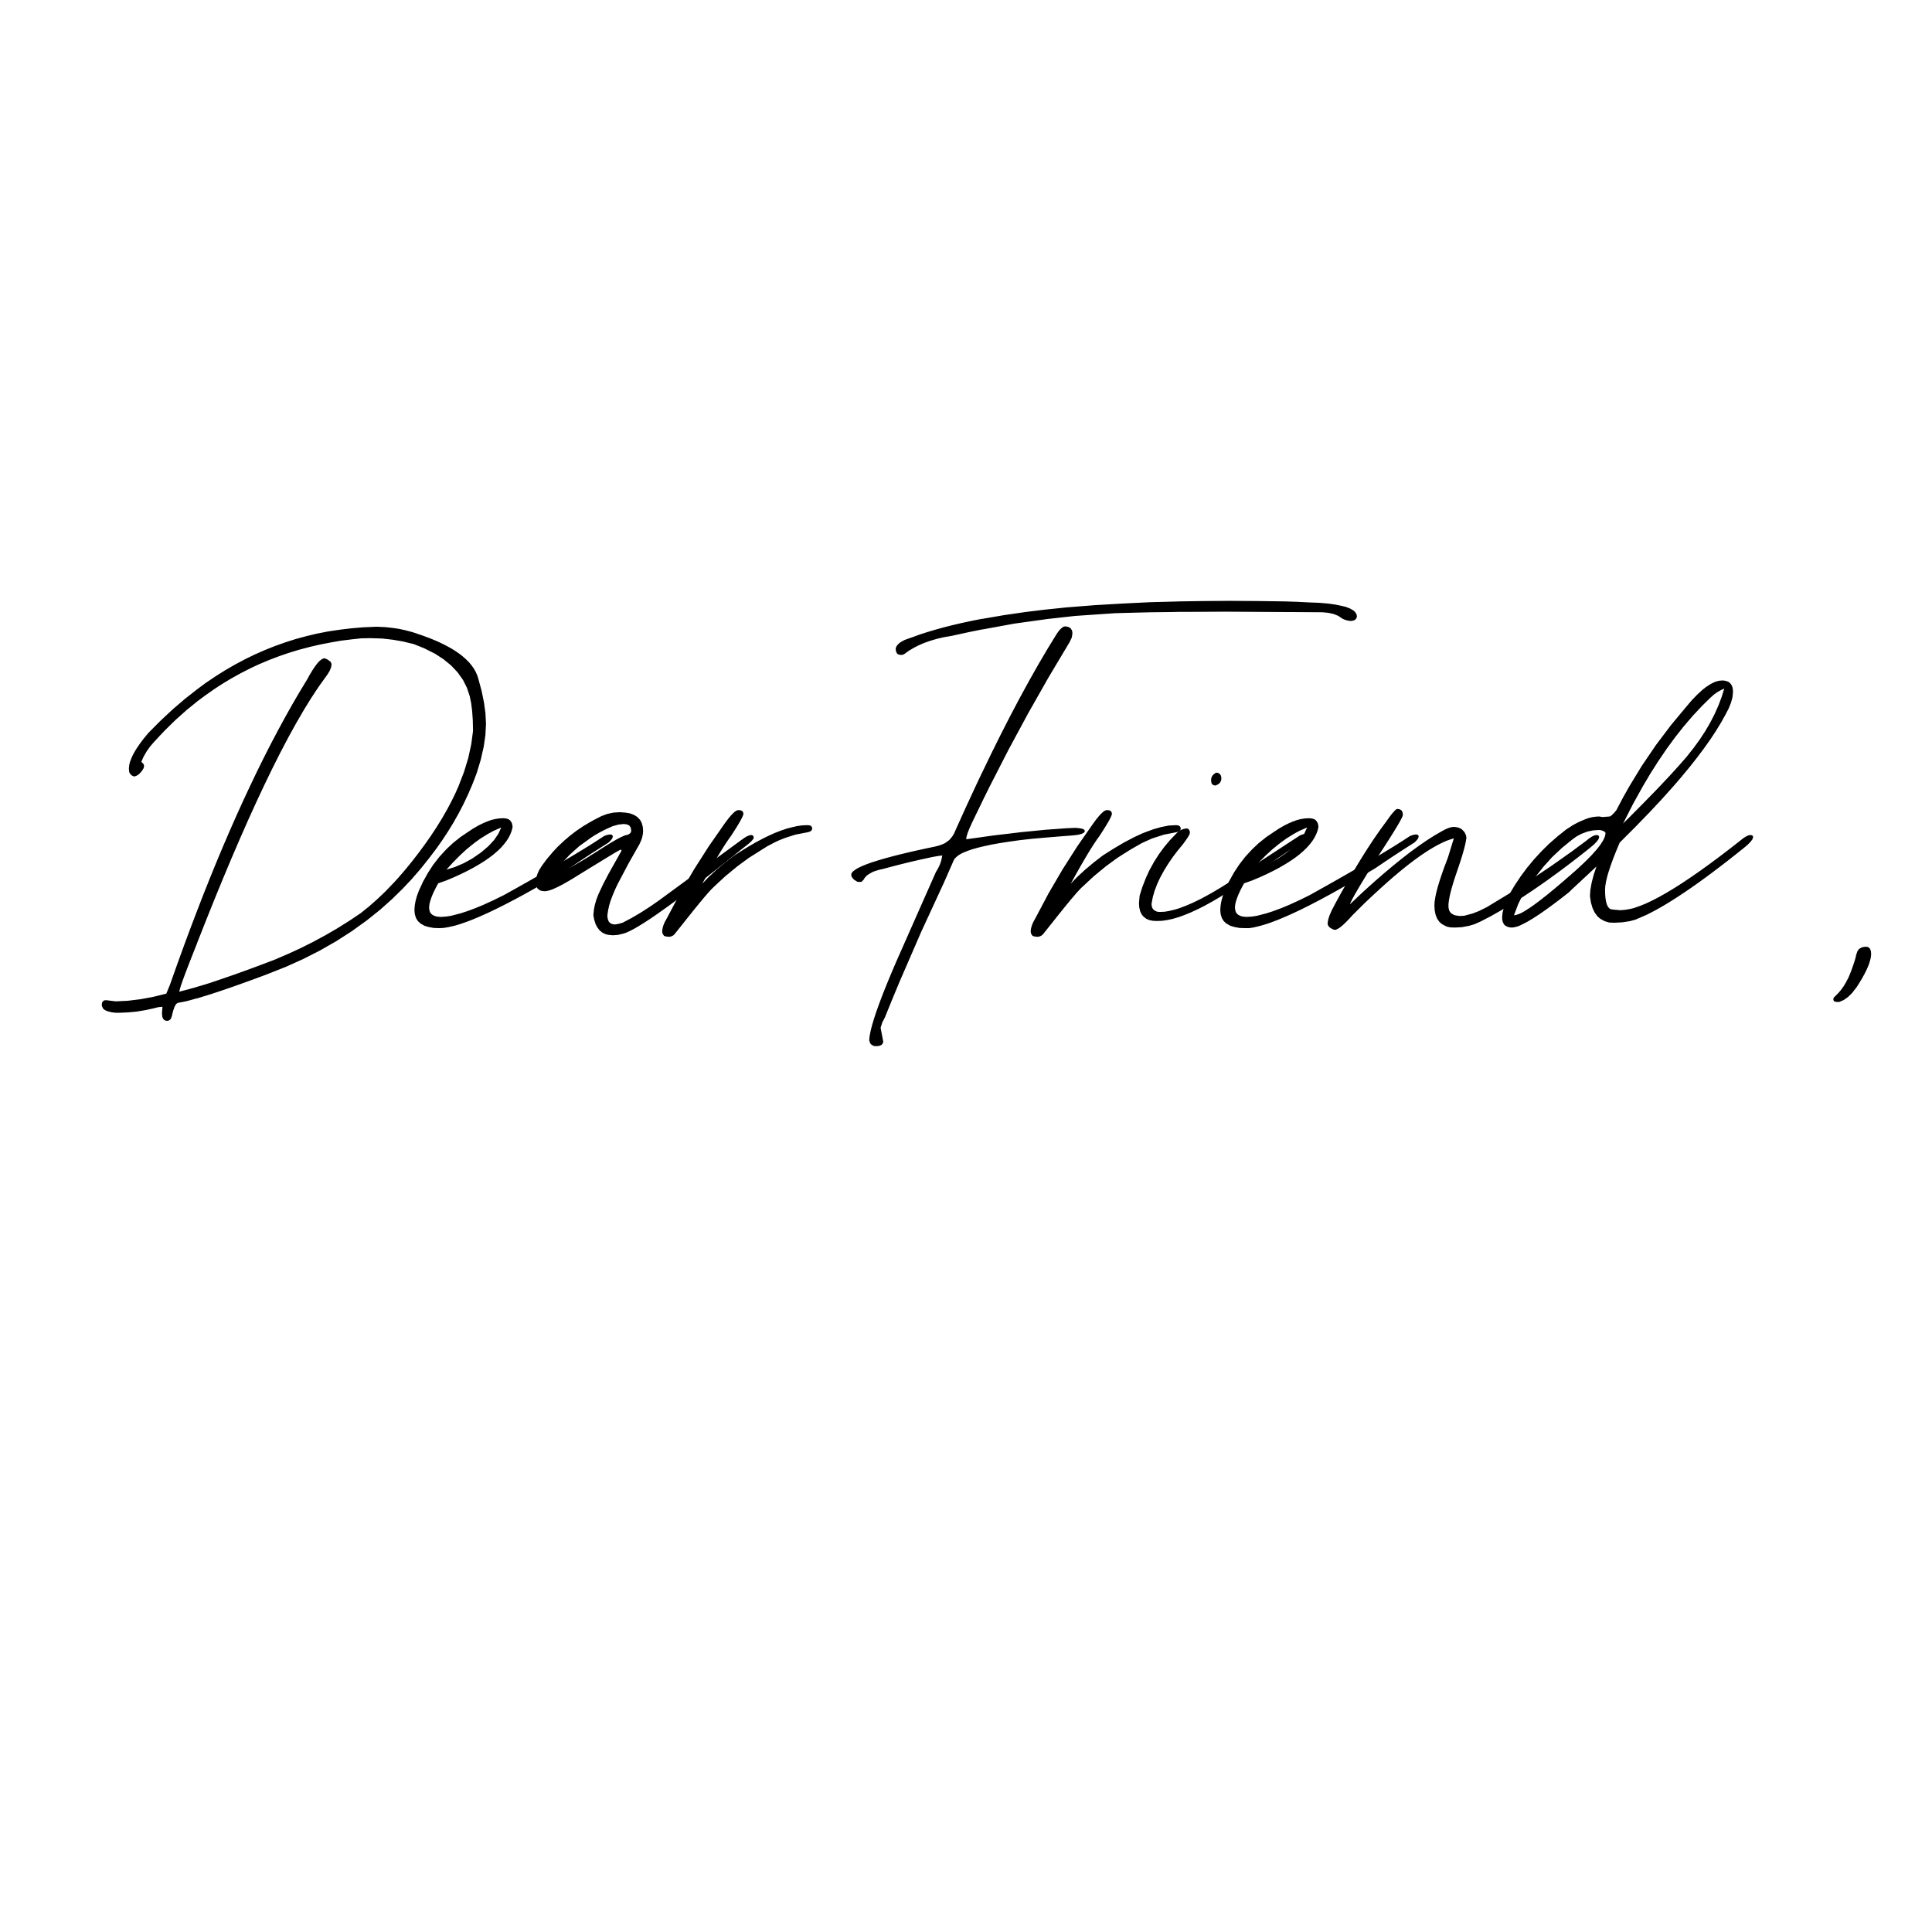 dearfriendblog.png